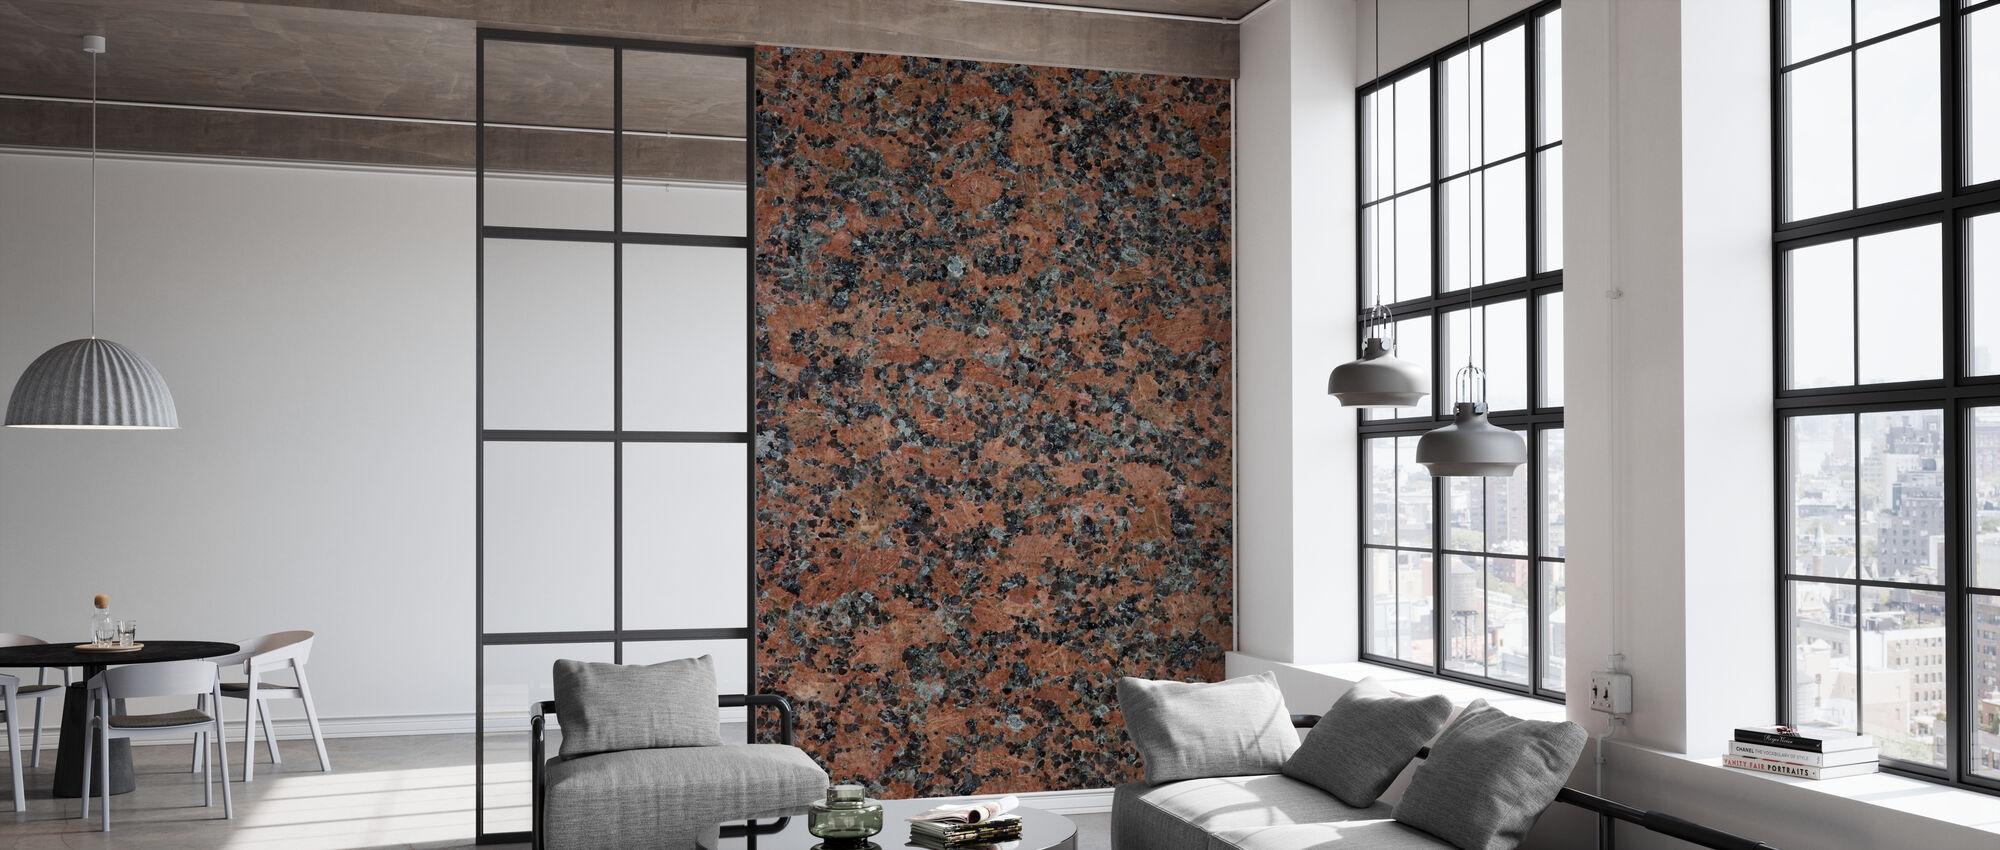 Sort og brun granit - Tapet - Kontor